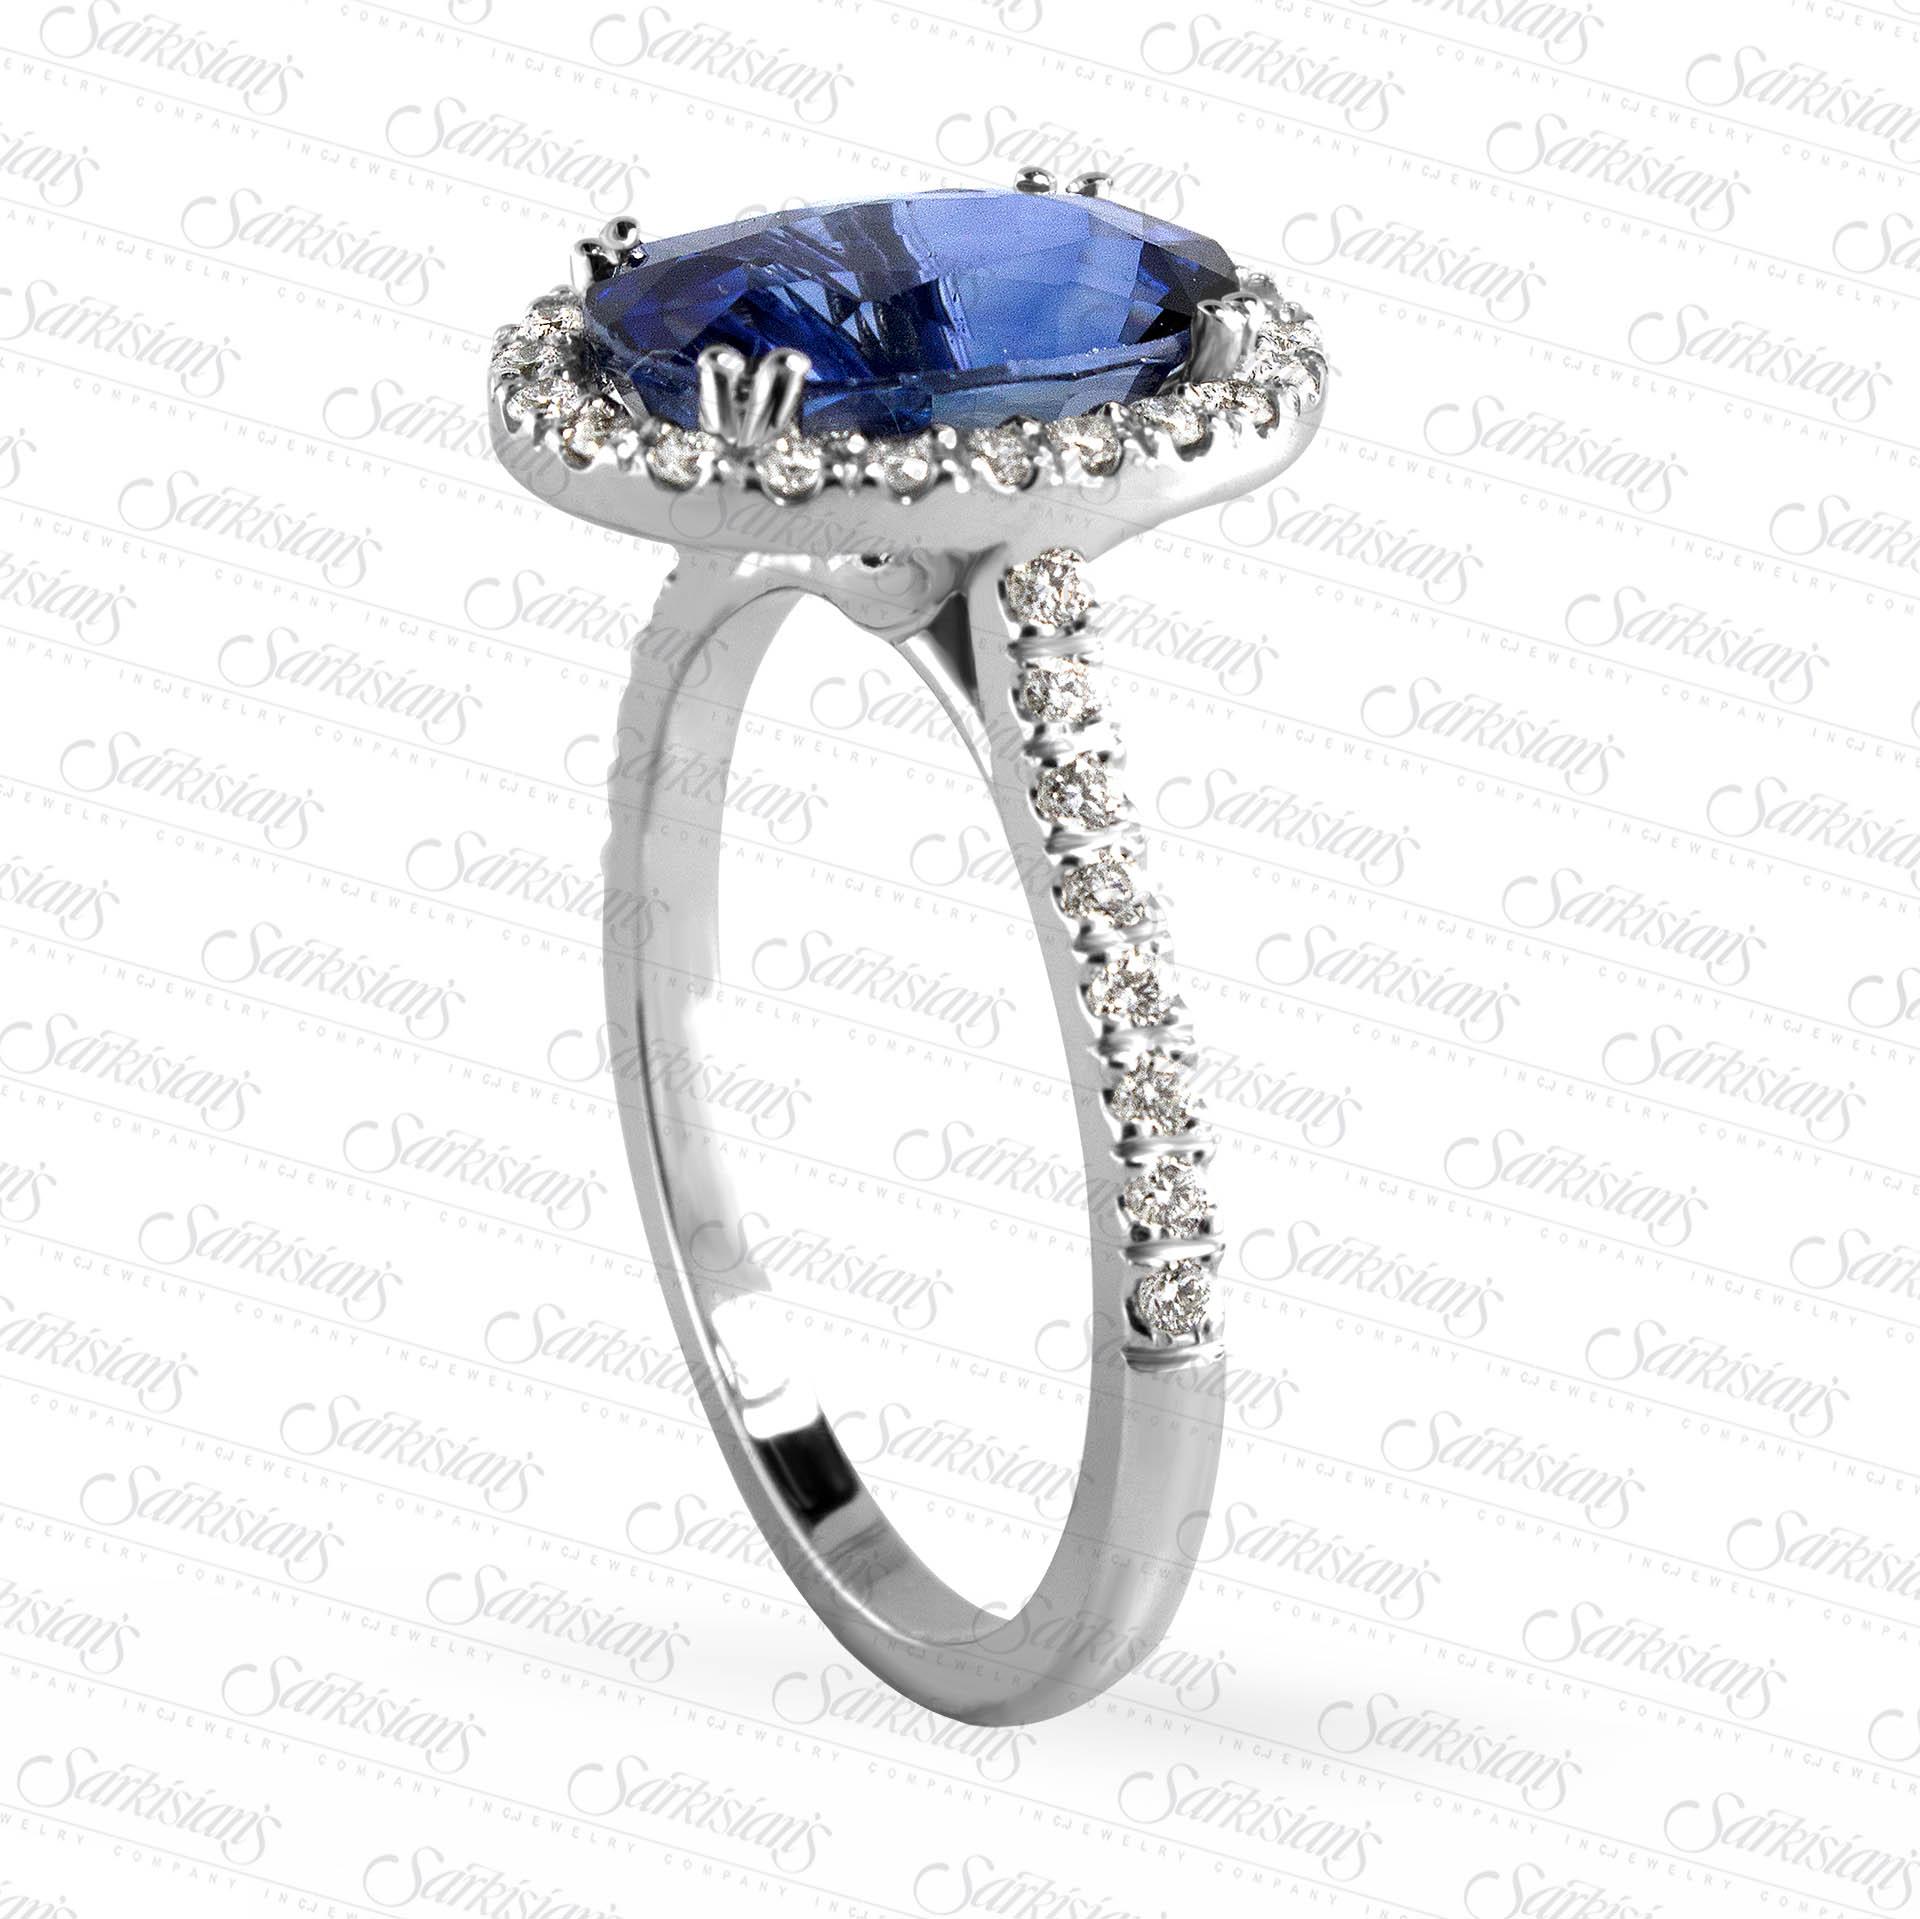 1 25 Carat Blue Sapphire Halo Diamond Engagement Ring, Gold